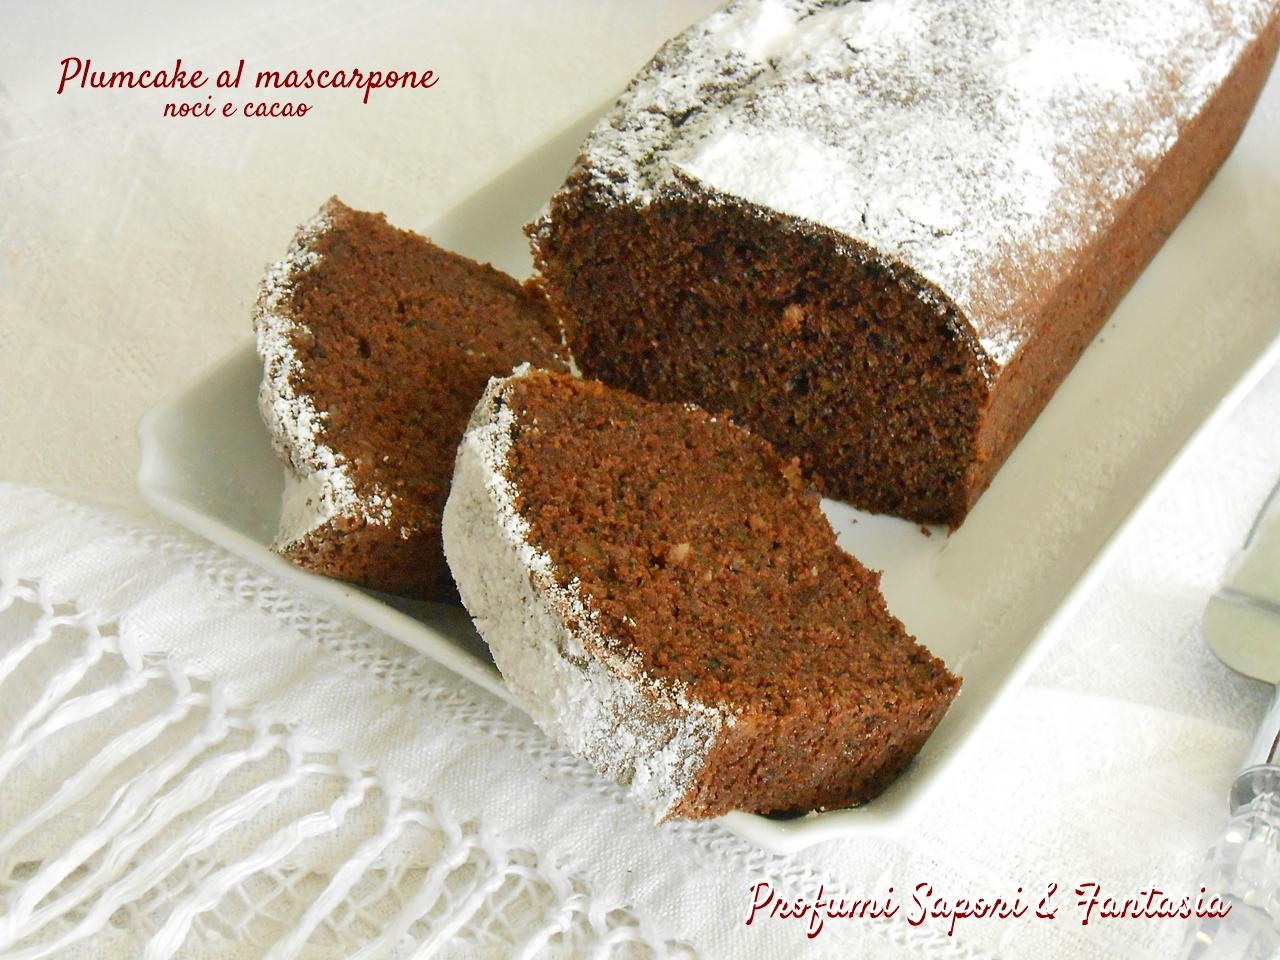 Plumcake al mascarpone noci e cacao si